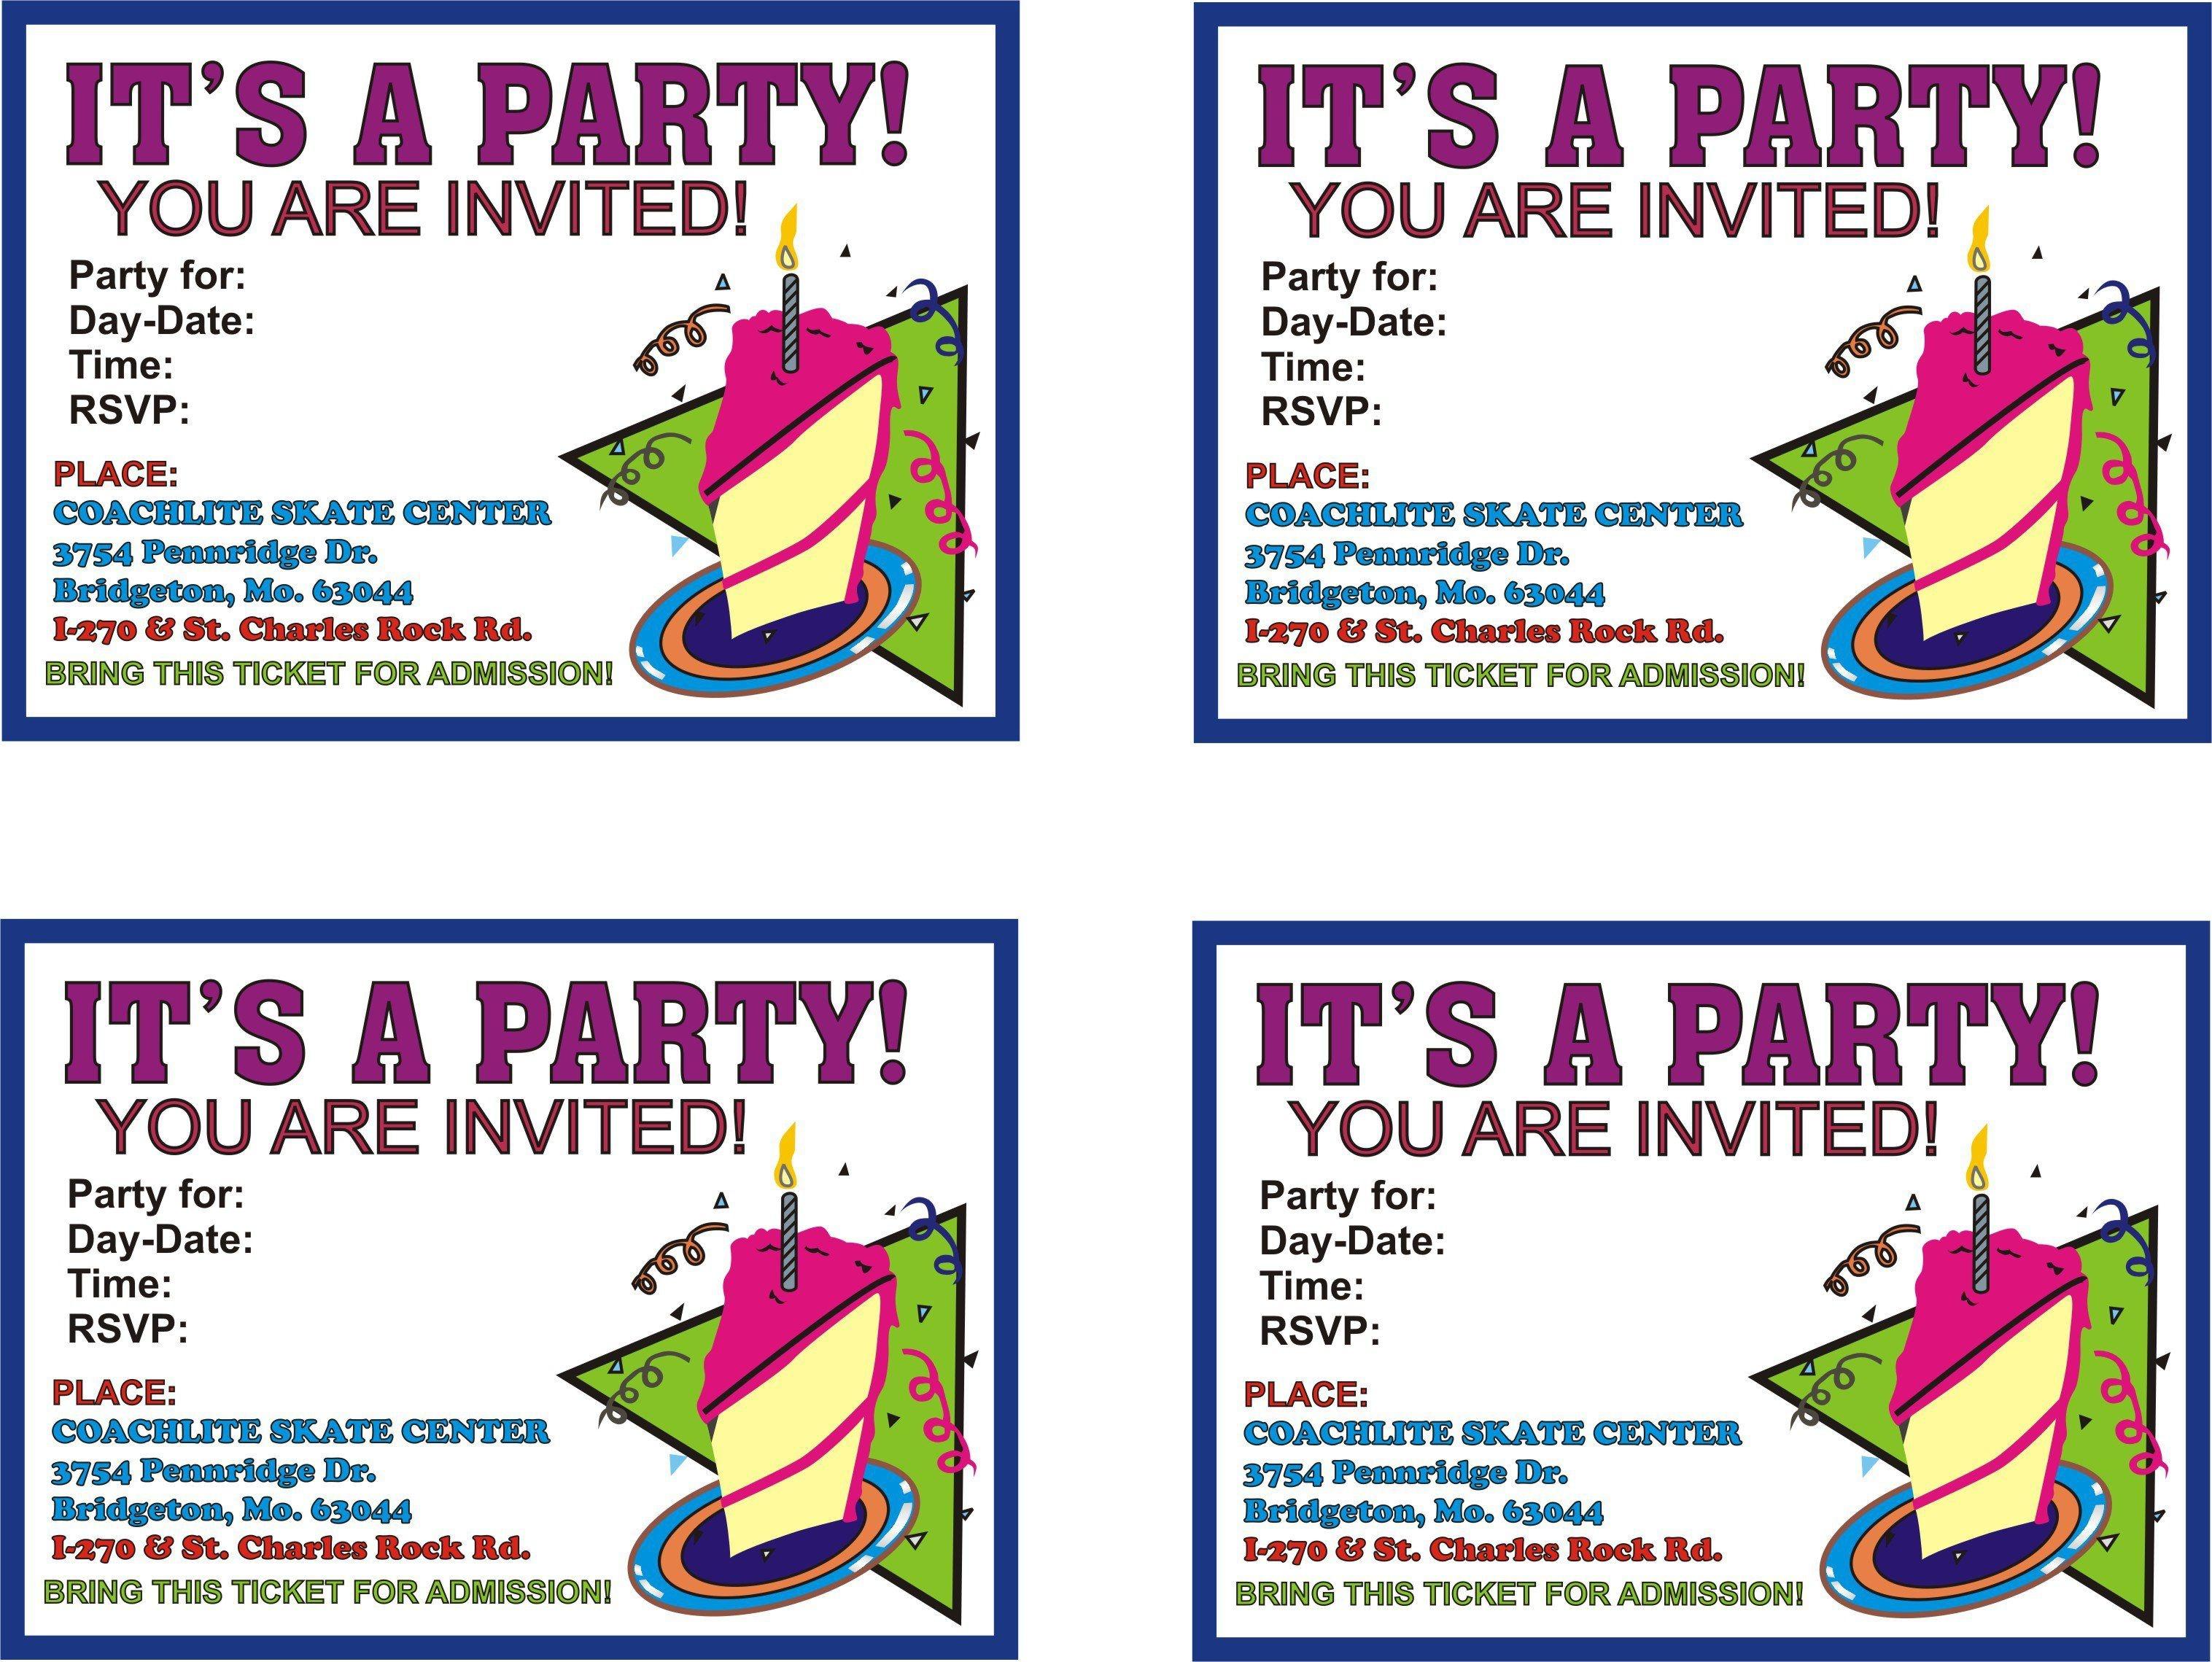 Print-Birthday-Invitations-Singapore | Birthday Invitations Template - Make Your Own Printable Birthday Cards Online Free